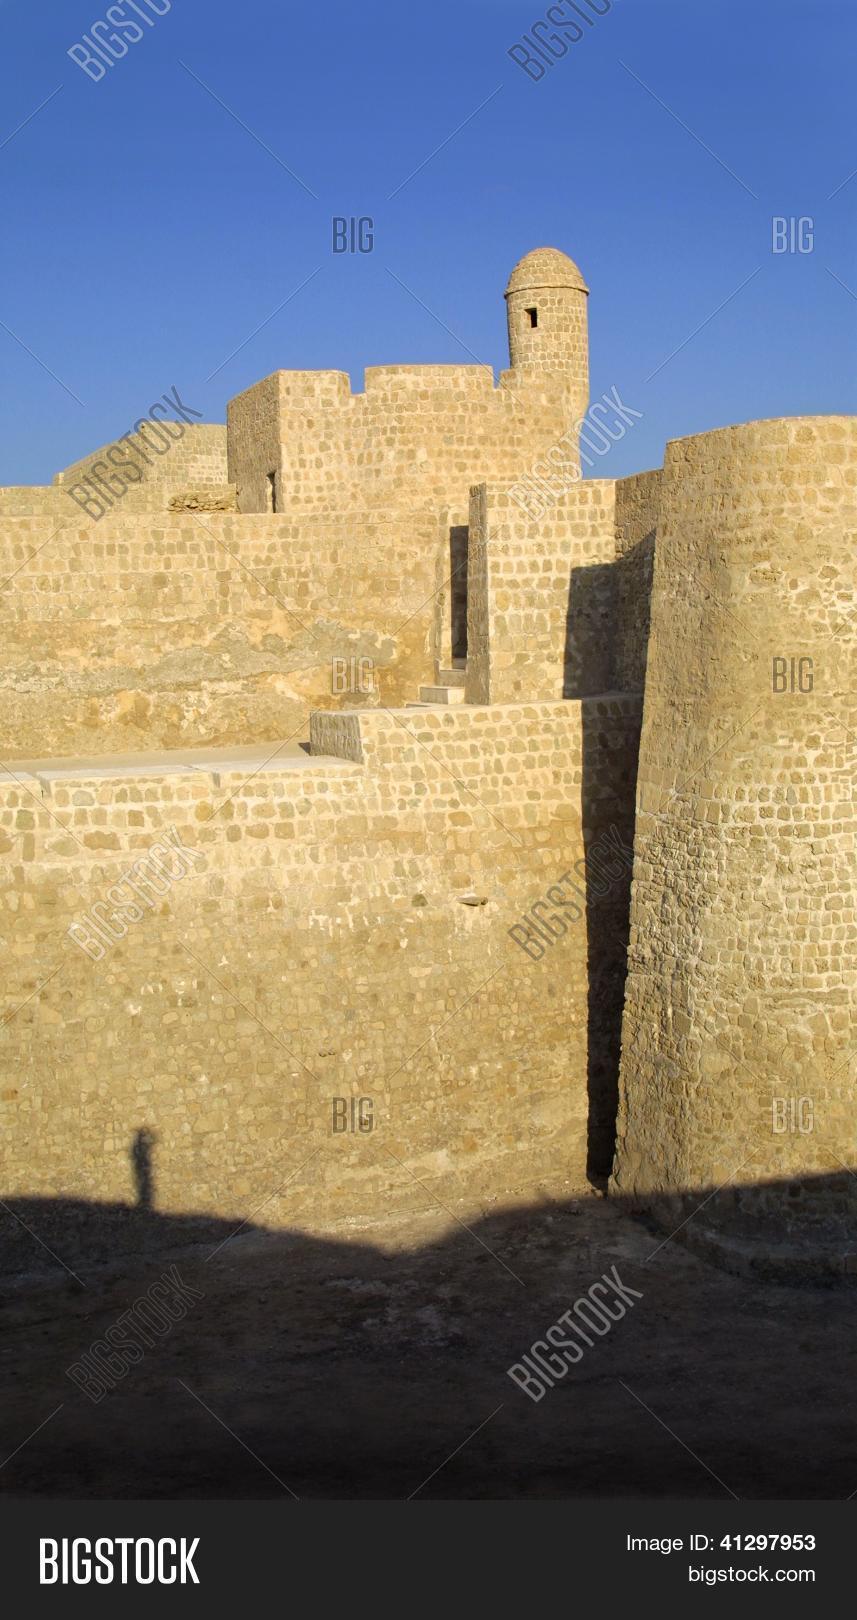 Bahrain Fort Image & Photo (Free Trial) | Bigstock